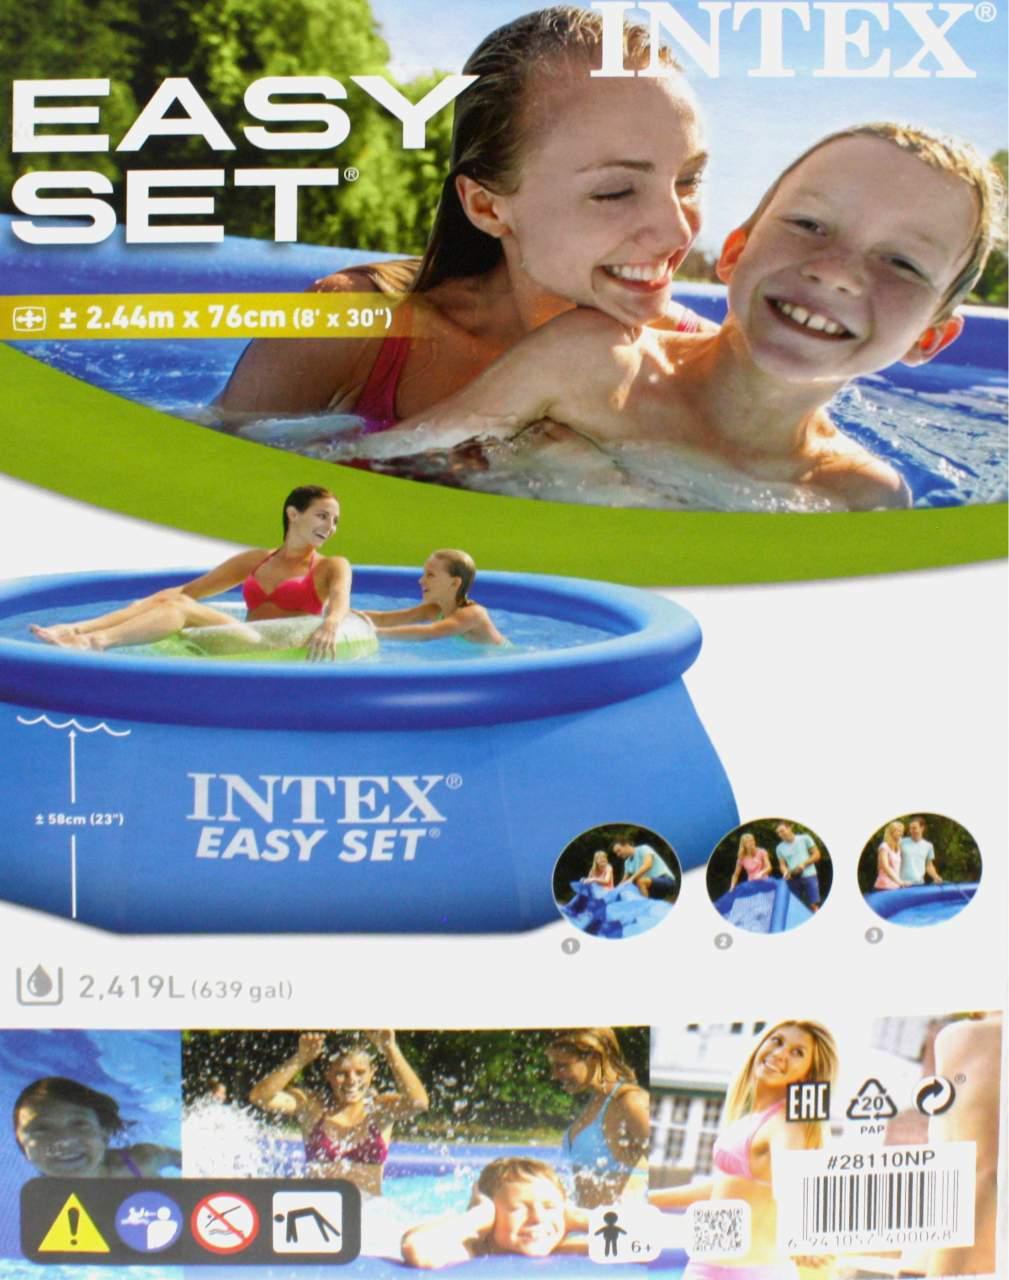 easy pool set intex 244 x 76 cm swimmingpool schwimmbecken pool planschbecken. Black Bedroom Furniture Sets. Home Design Ideas